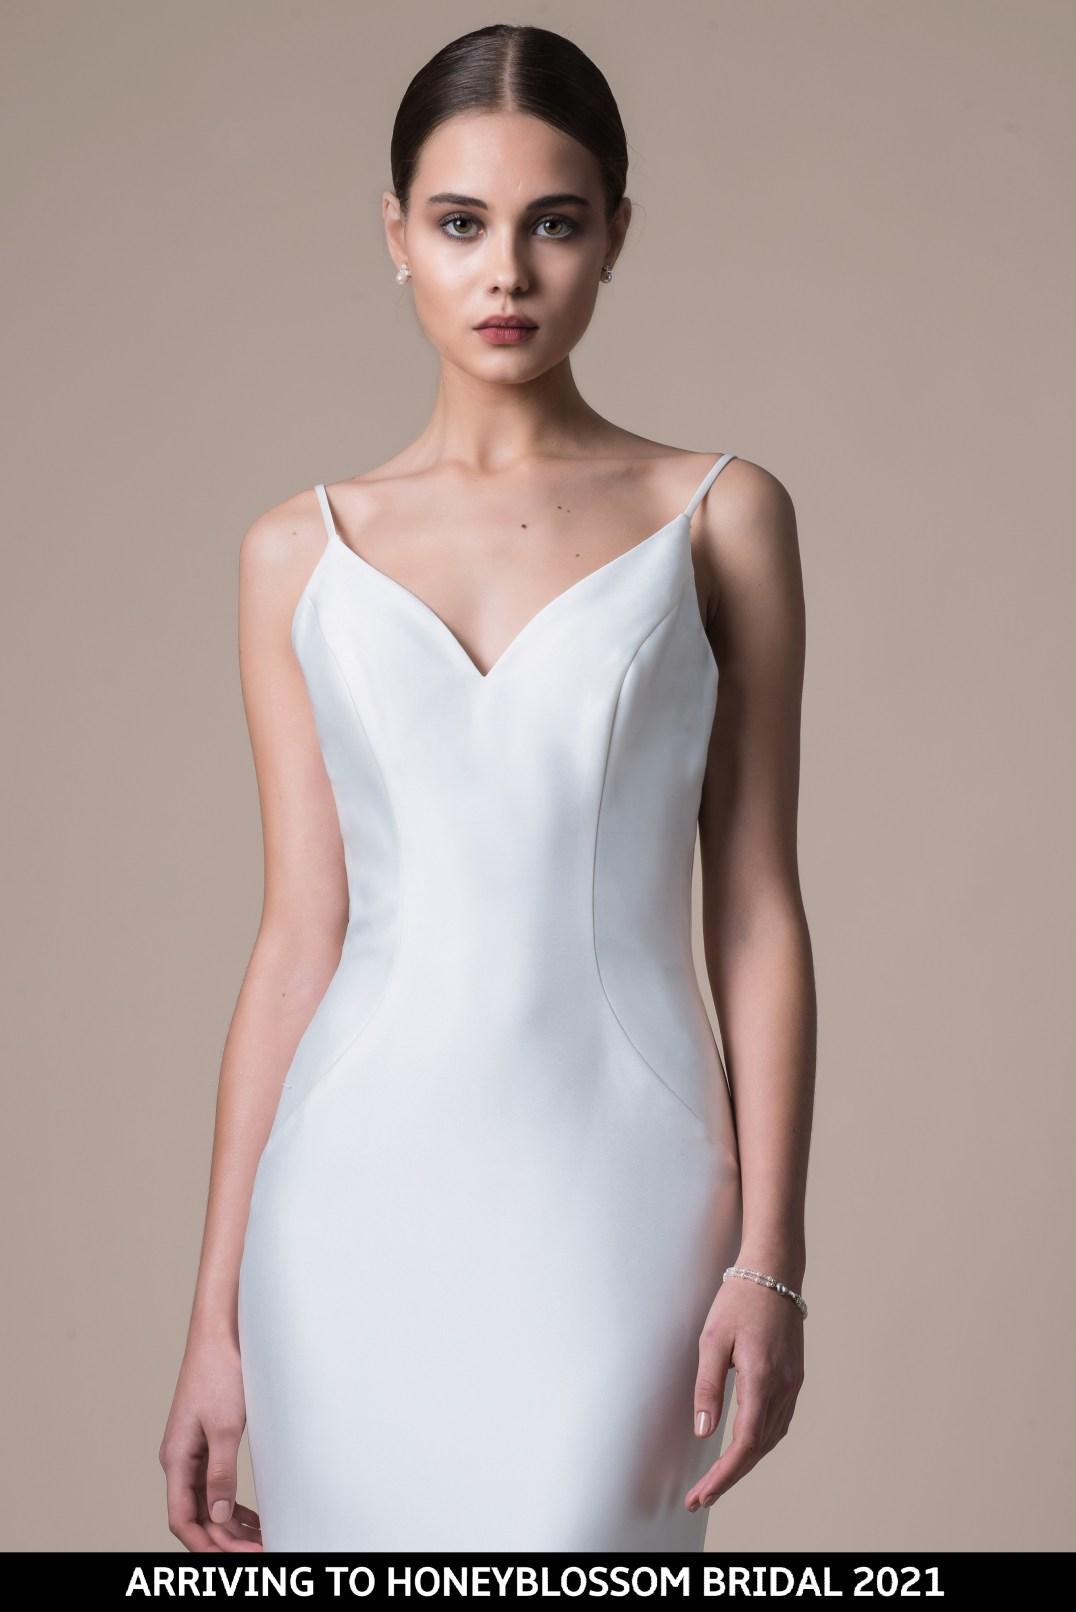 MiaMia Mariah bridal dress arriving soon to Honeyblossom Bridal